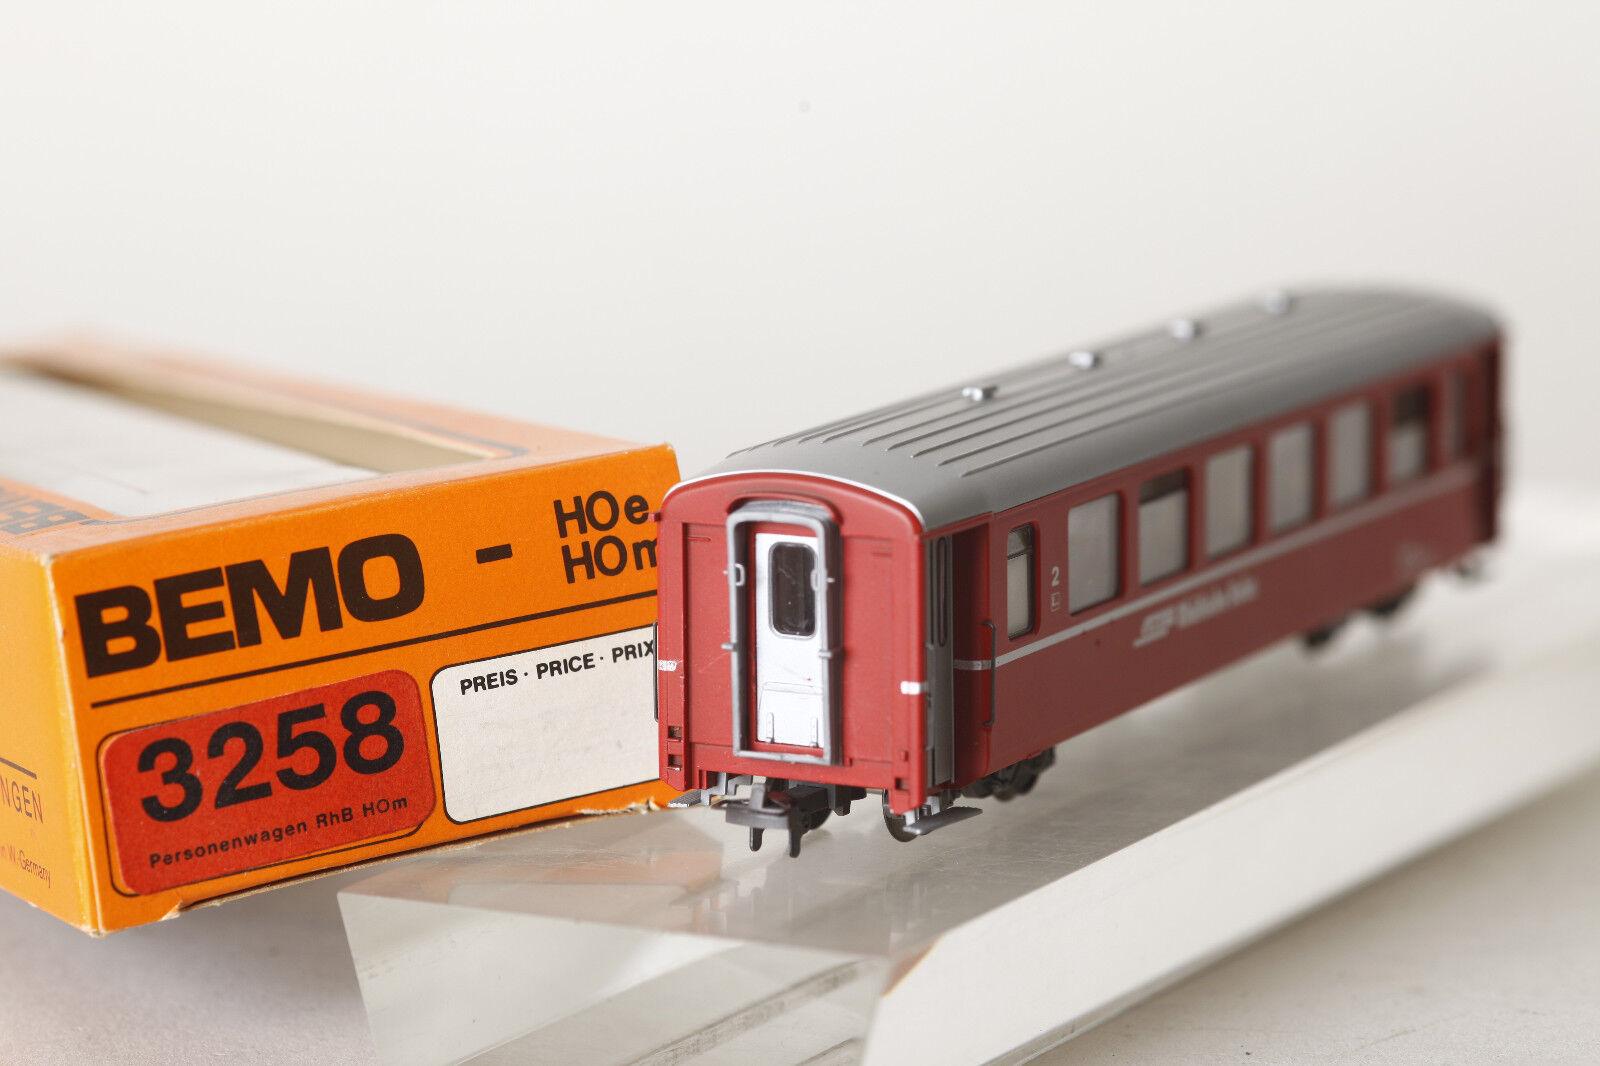 BEMO h0m 3258 vagoni RHB Rhätische Bahn B 2458 2.kl ROSSO  90220